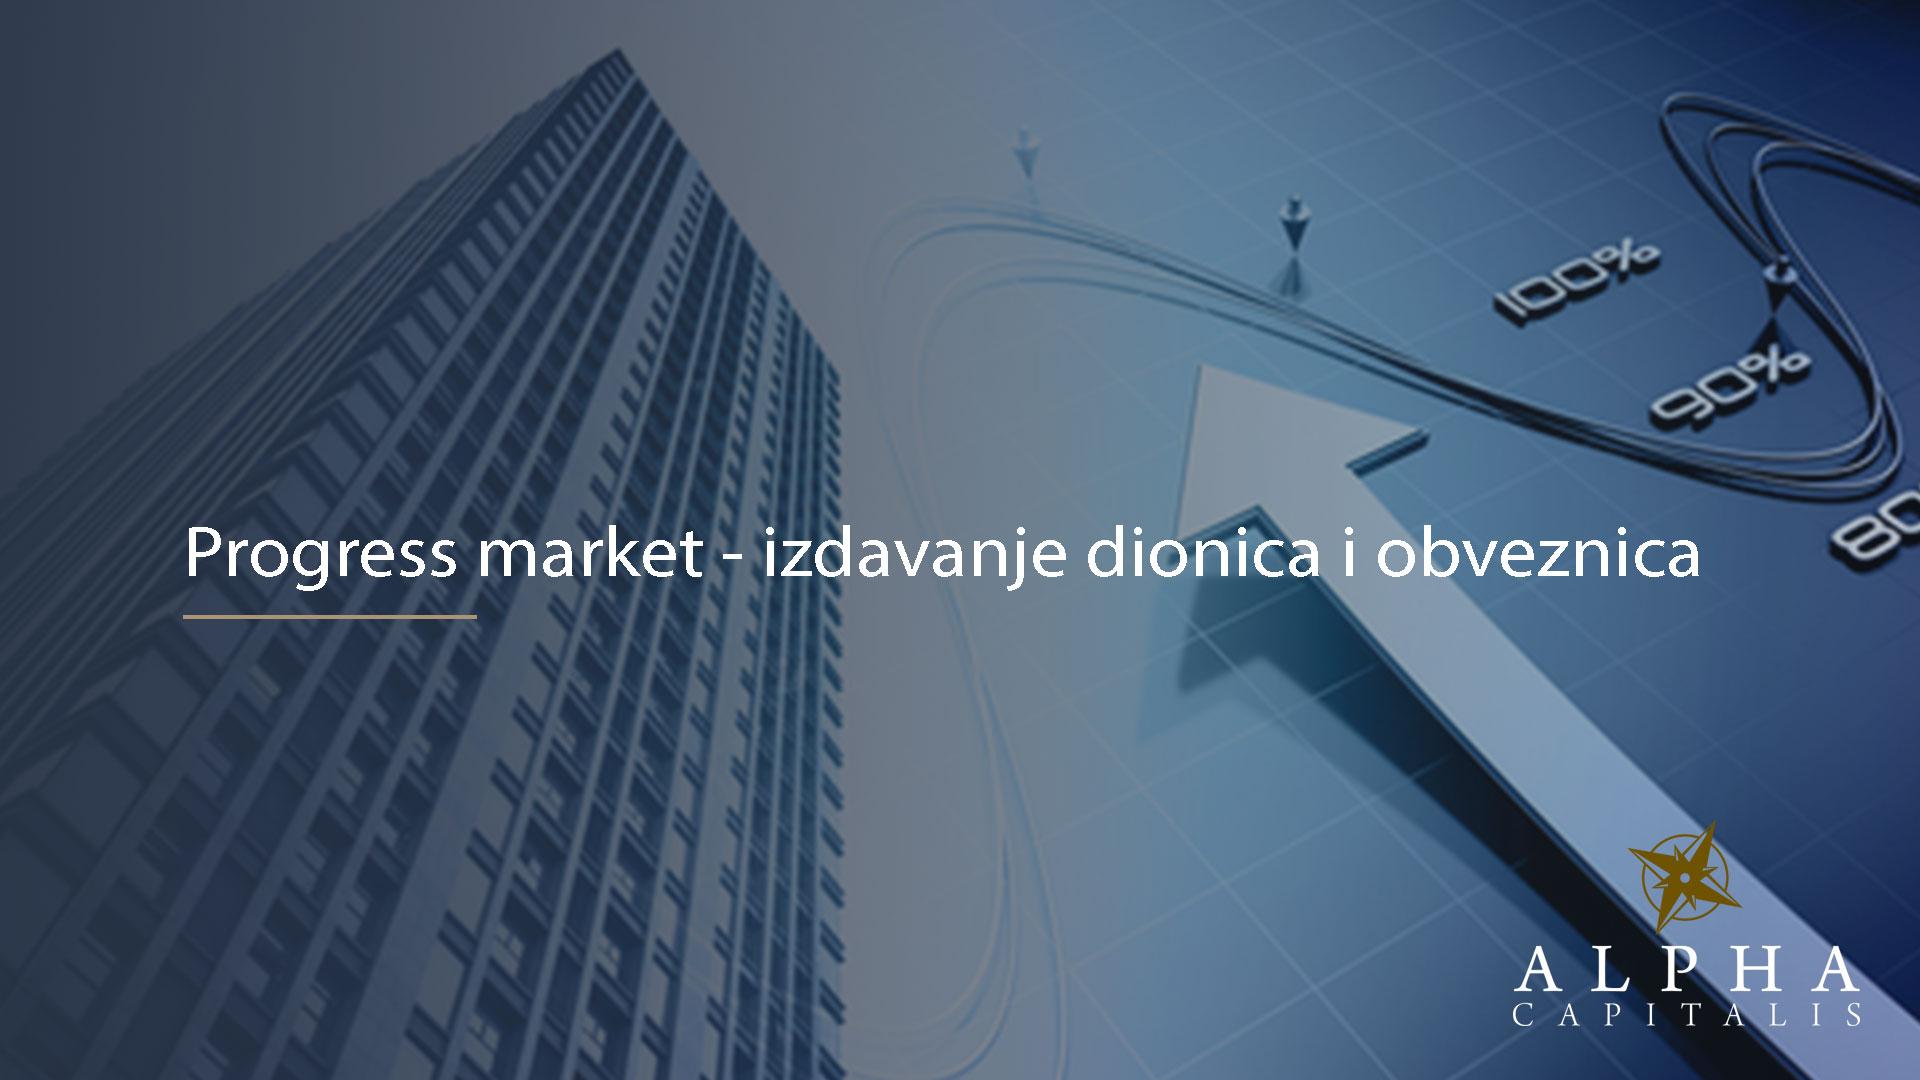 Progress market 2020 02 06 - Progress market - izdavanje dionica i obveznica